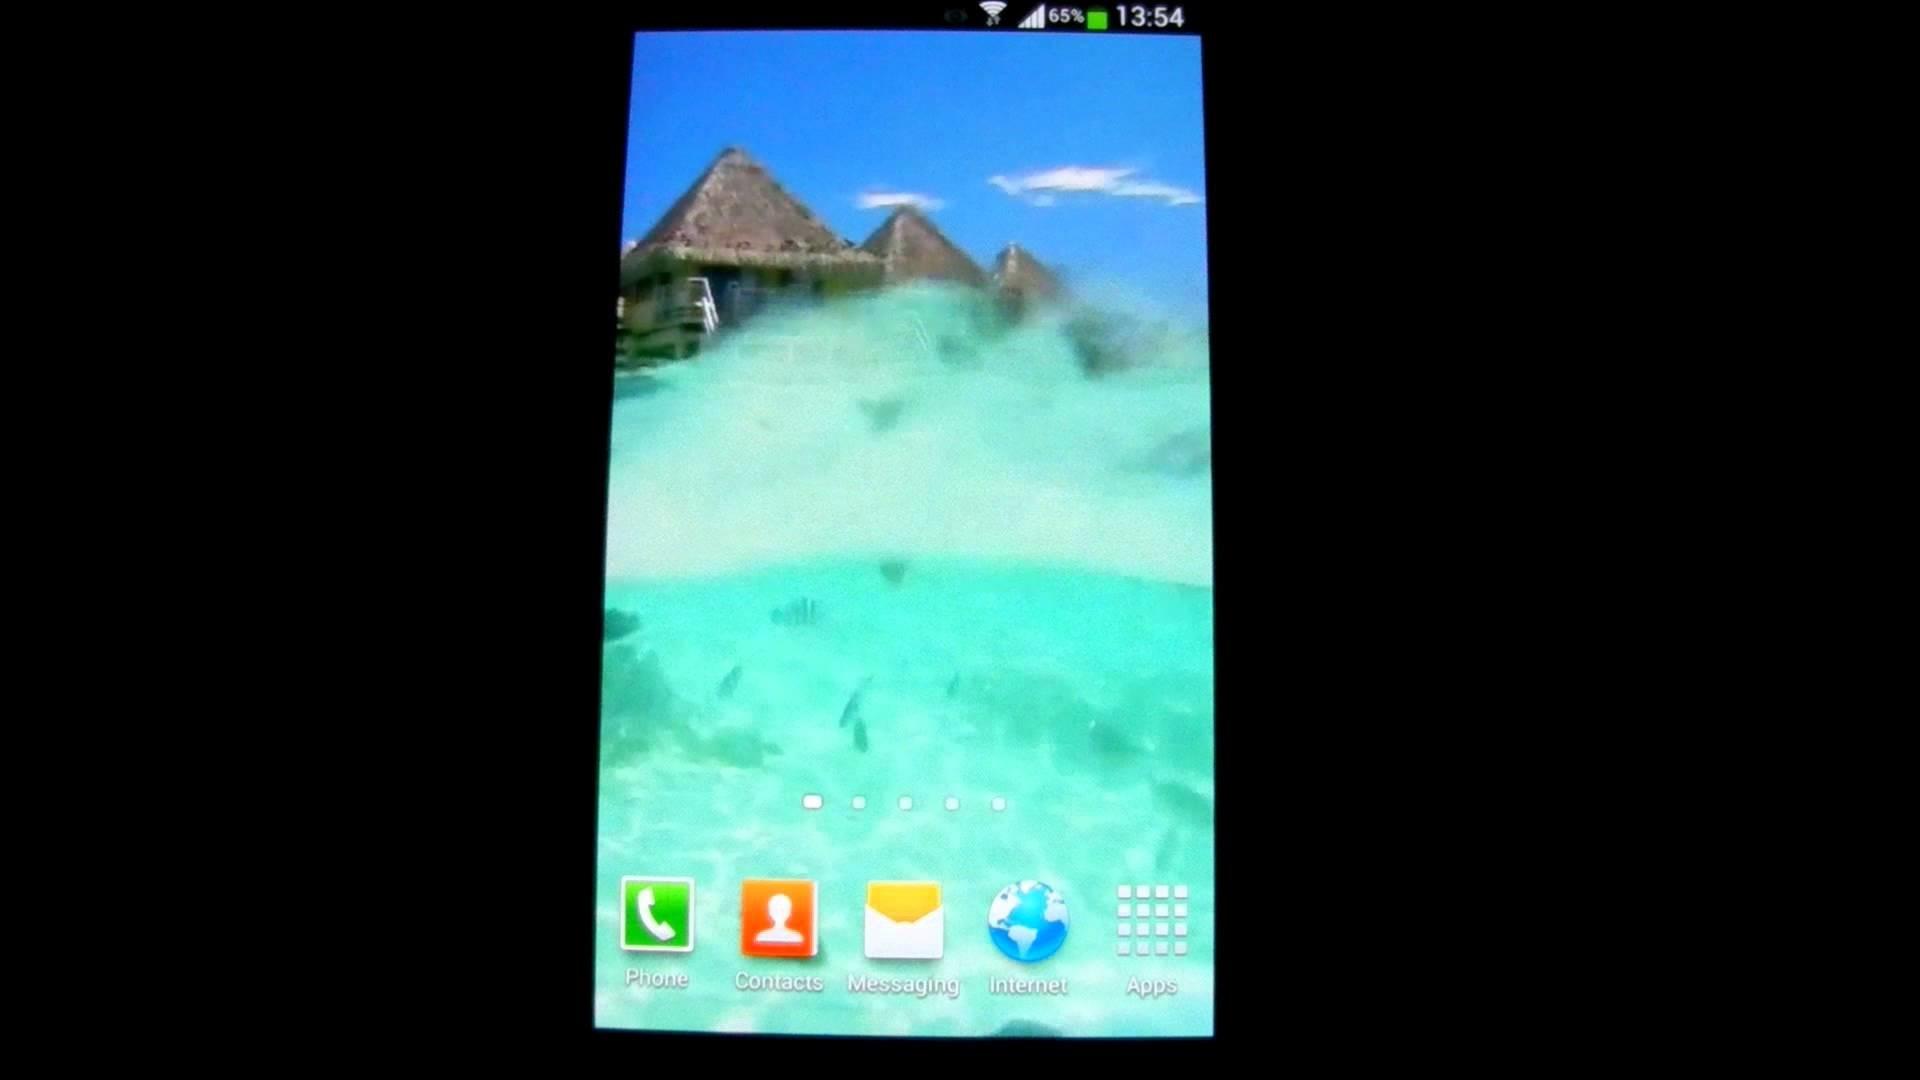 Lagoon Waves Live Wallpaper HD